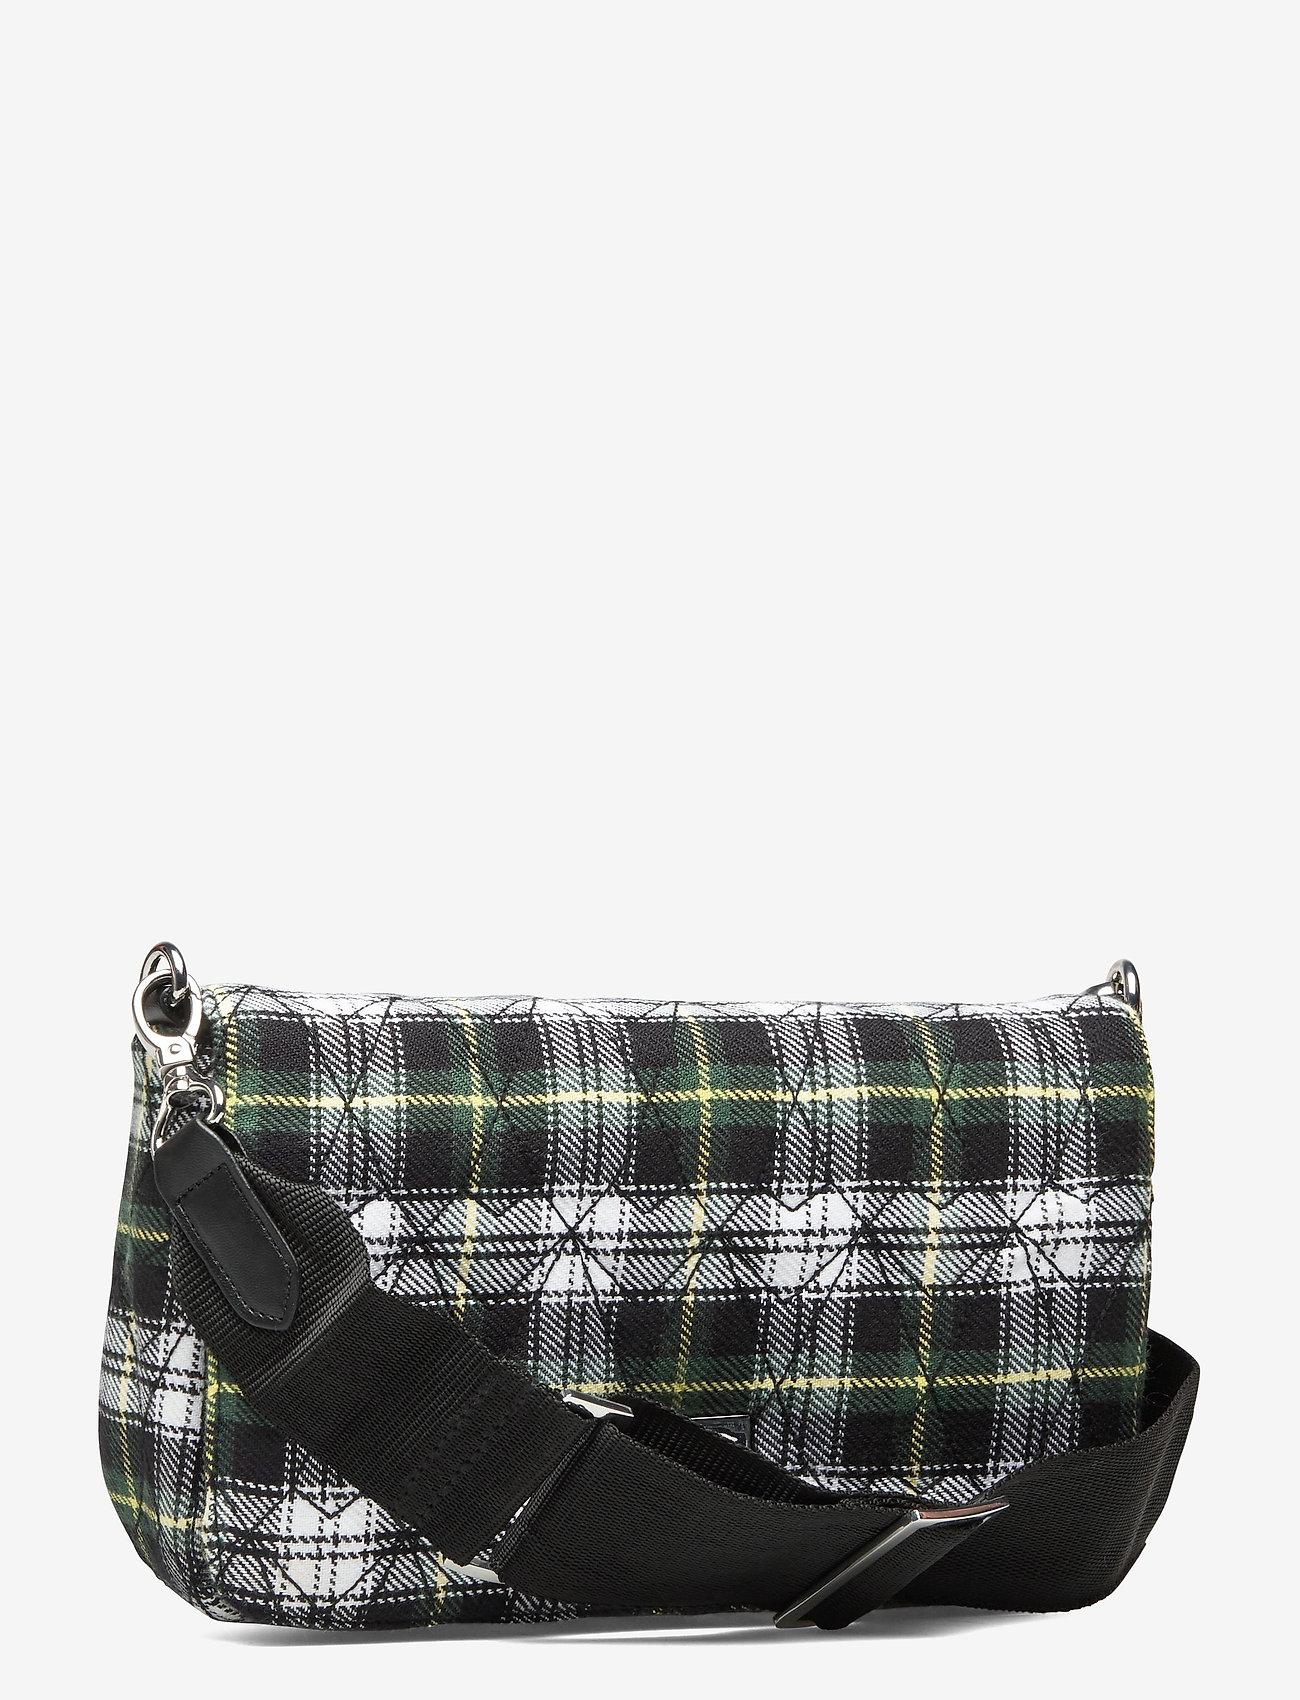 Ry Mikky Bag (Black) (59.40 €) - Becksöndergaard 9M4T9